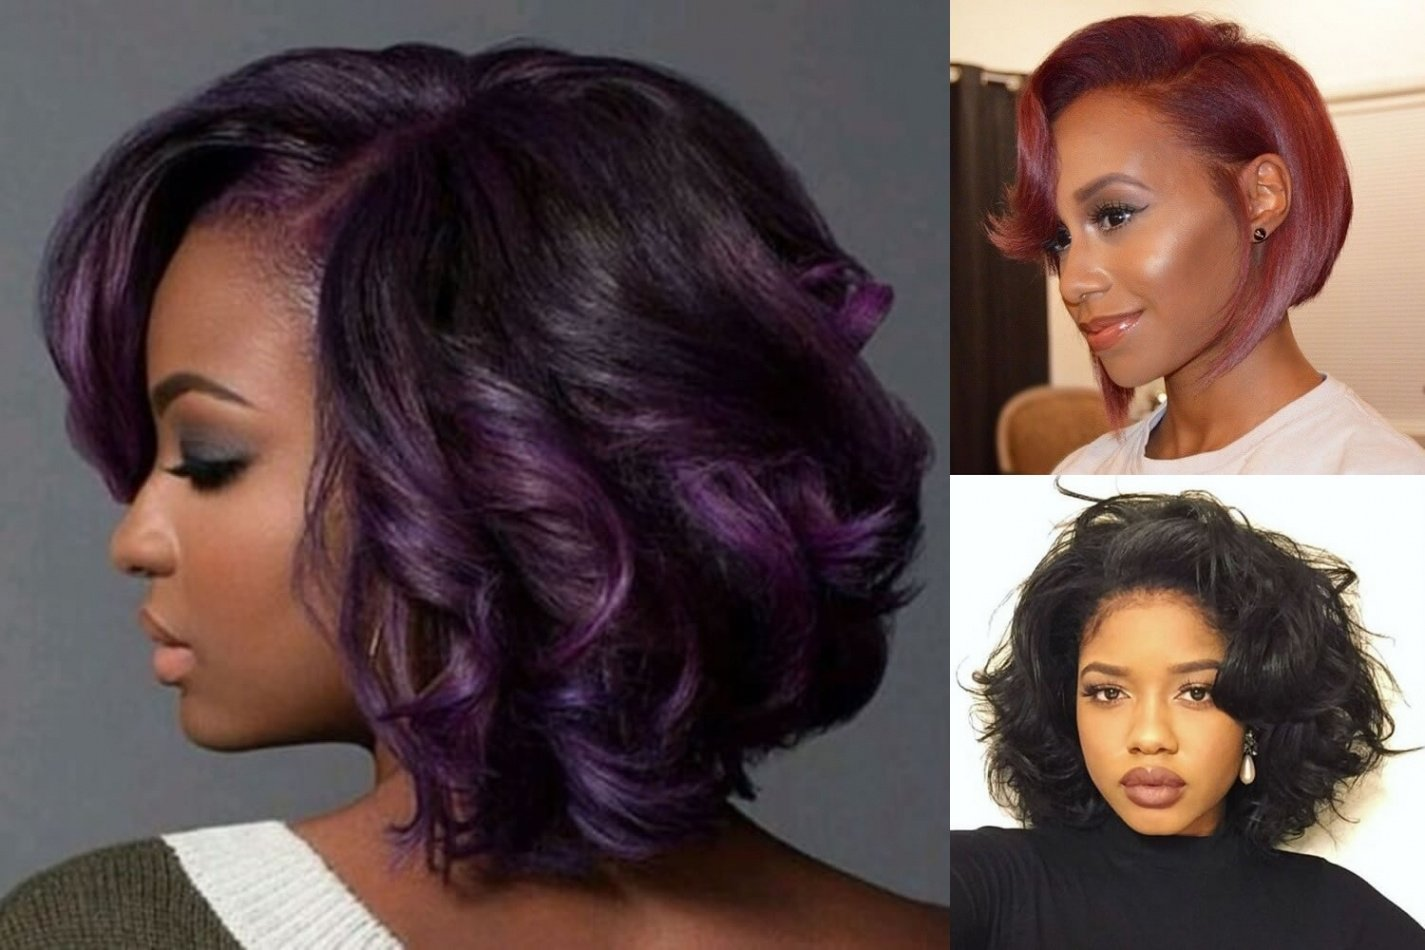 10 Stunning Hair Color Ideas For Bob Hairstyles best 45 short bob hairstyle for black women hair color ideas 2020